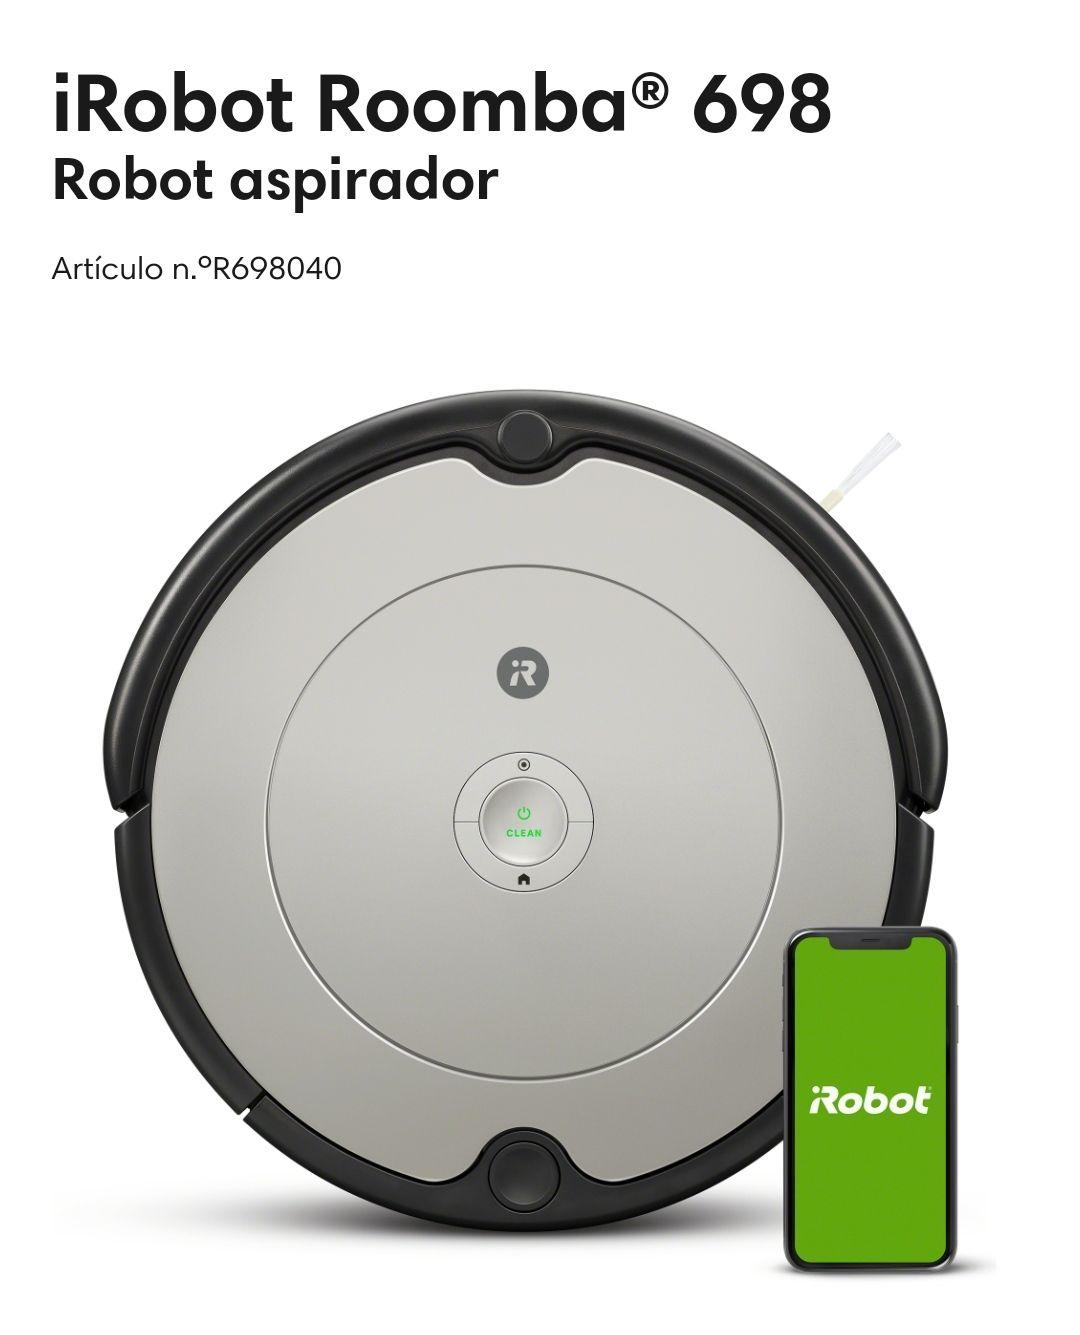 iRobot Roomba 698 (Web iRobot)